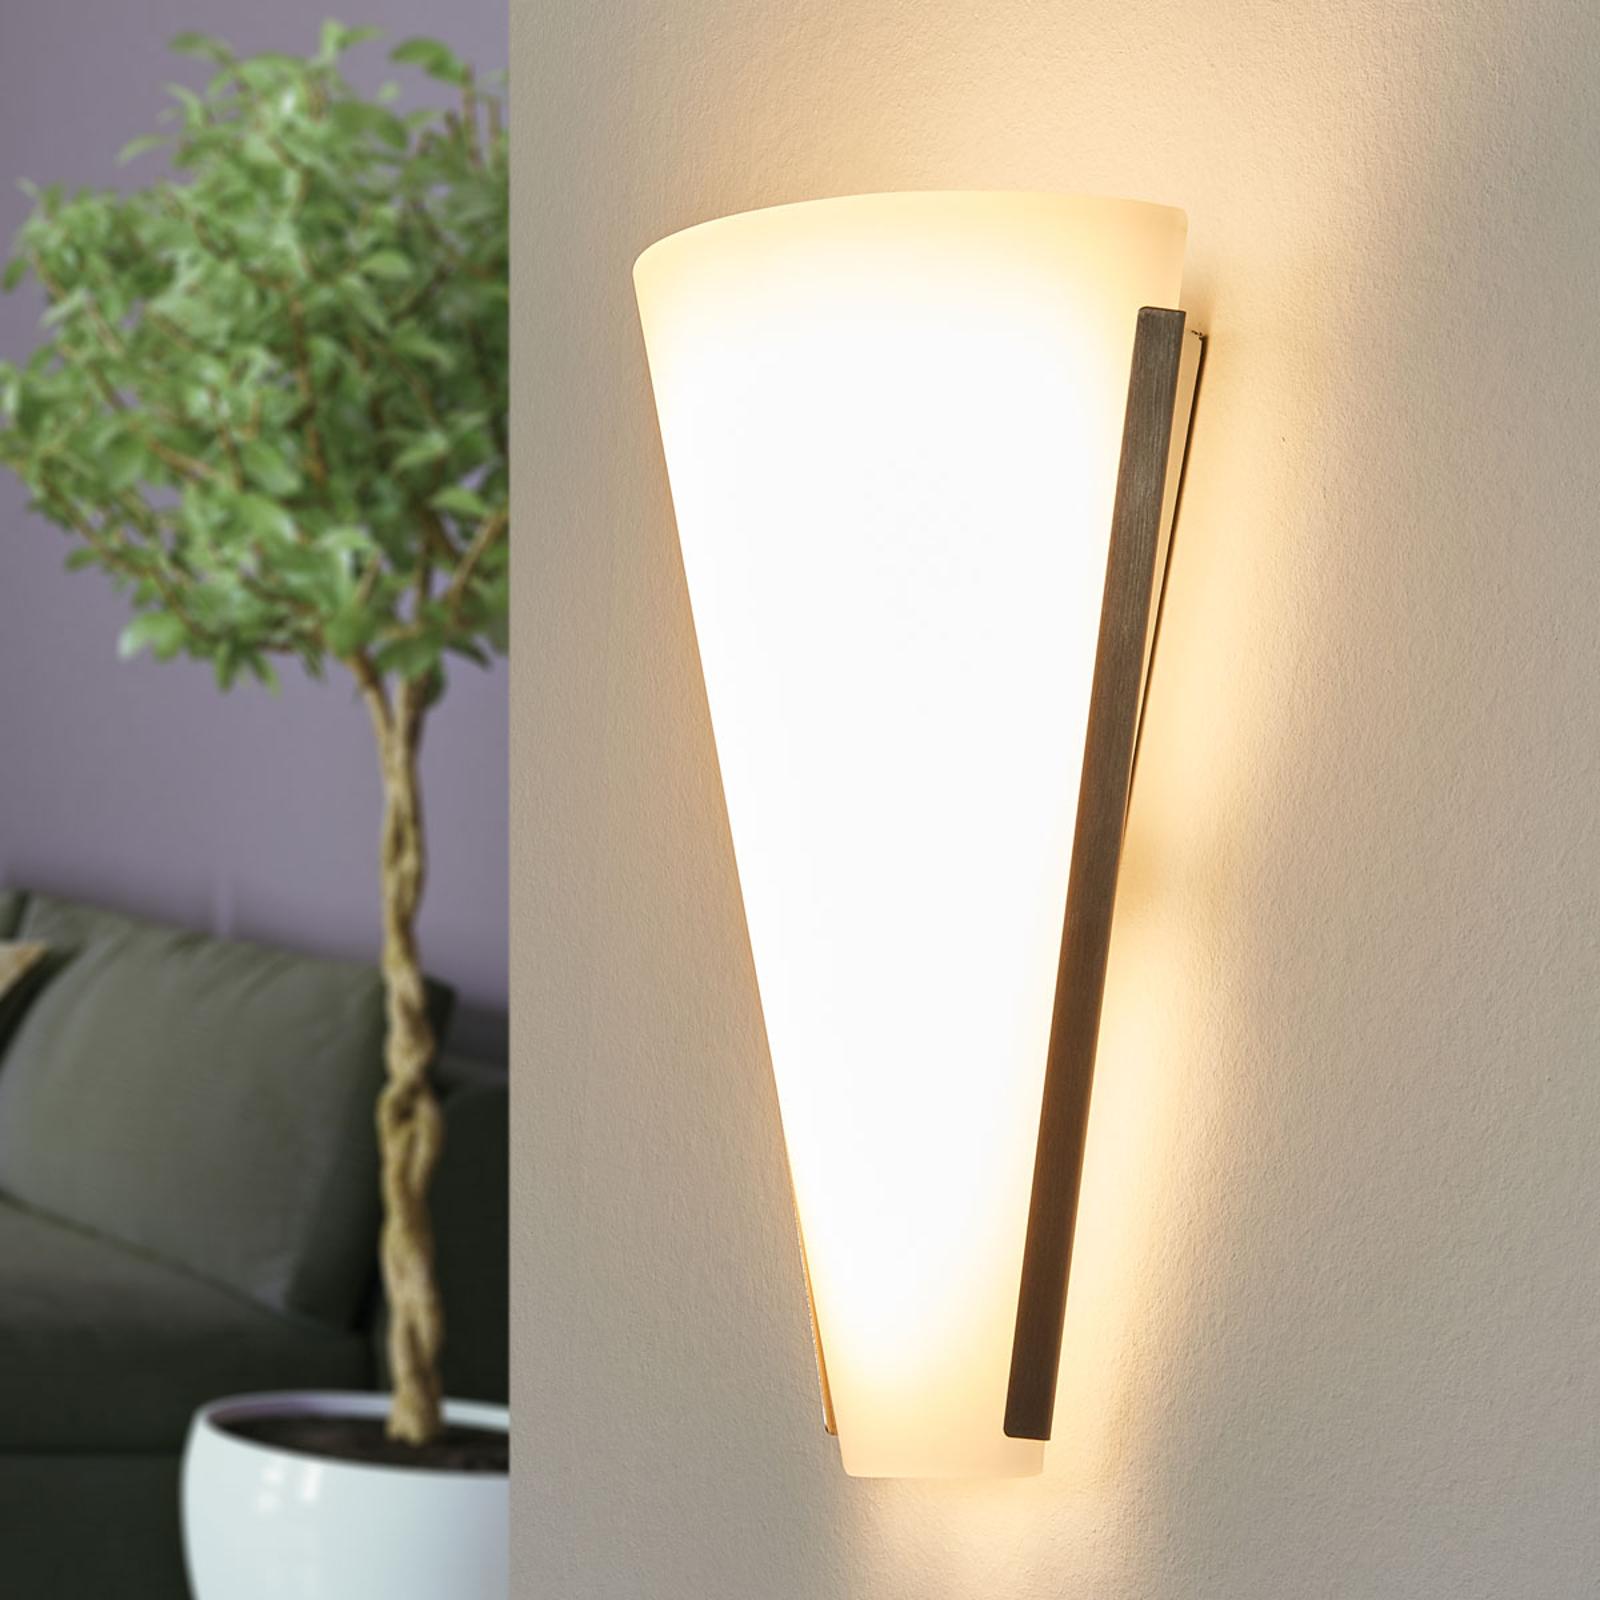 Piękna lampa ścienna Luk z diodami LED